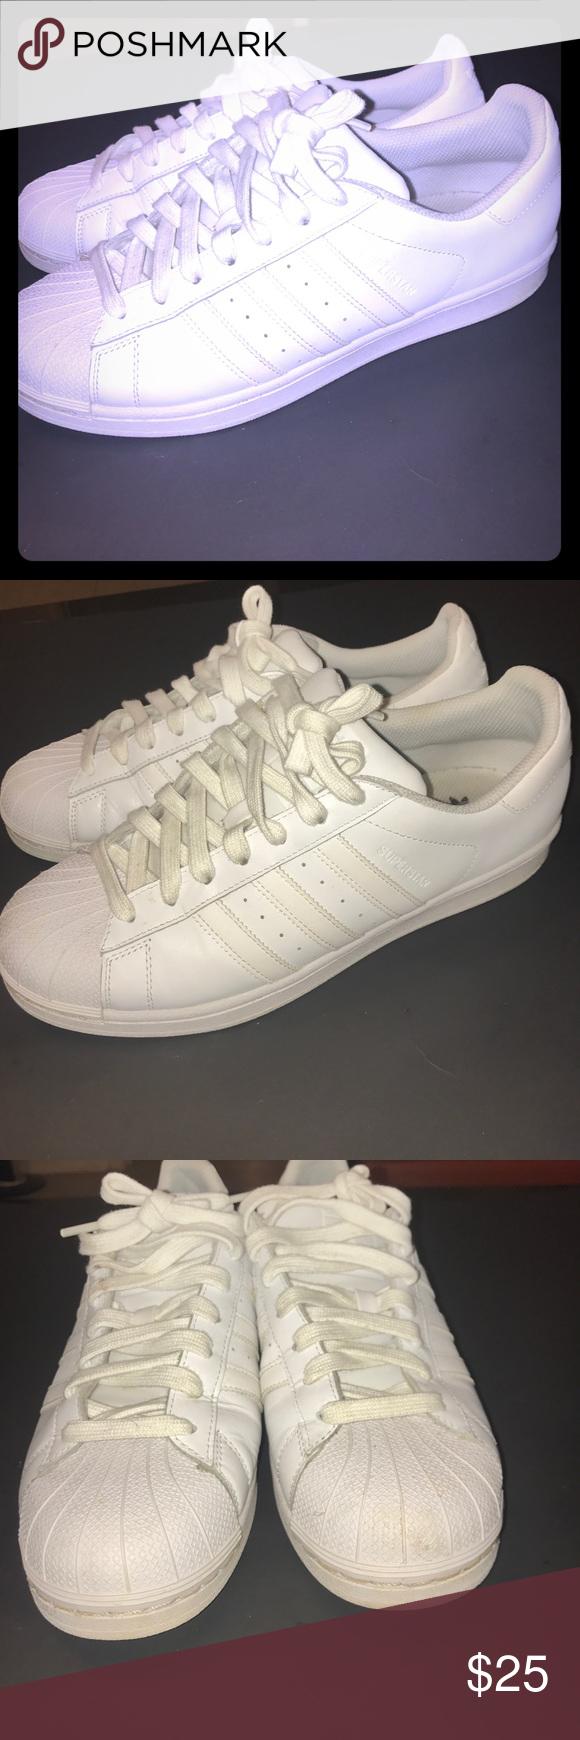 uomini è adidas scarpe da tennis pinterest le adidas, scarpe da ginnastica